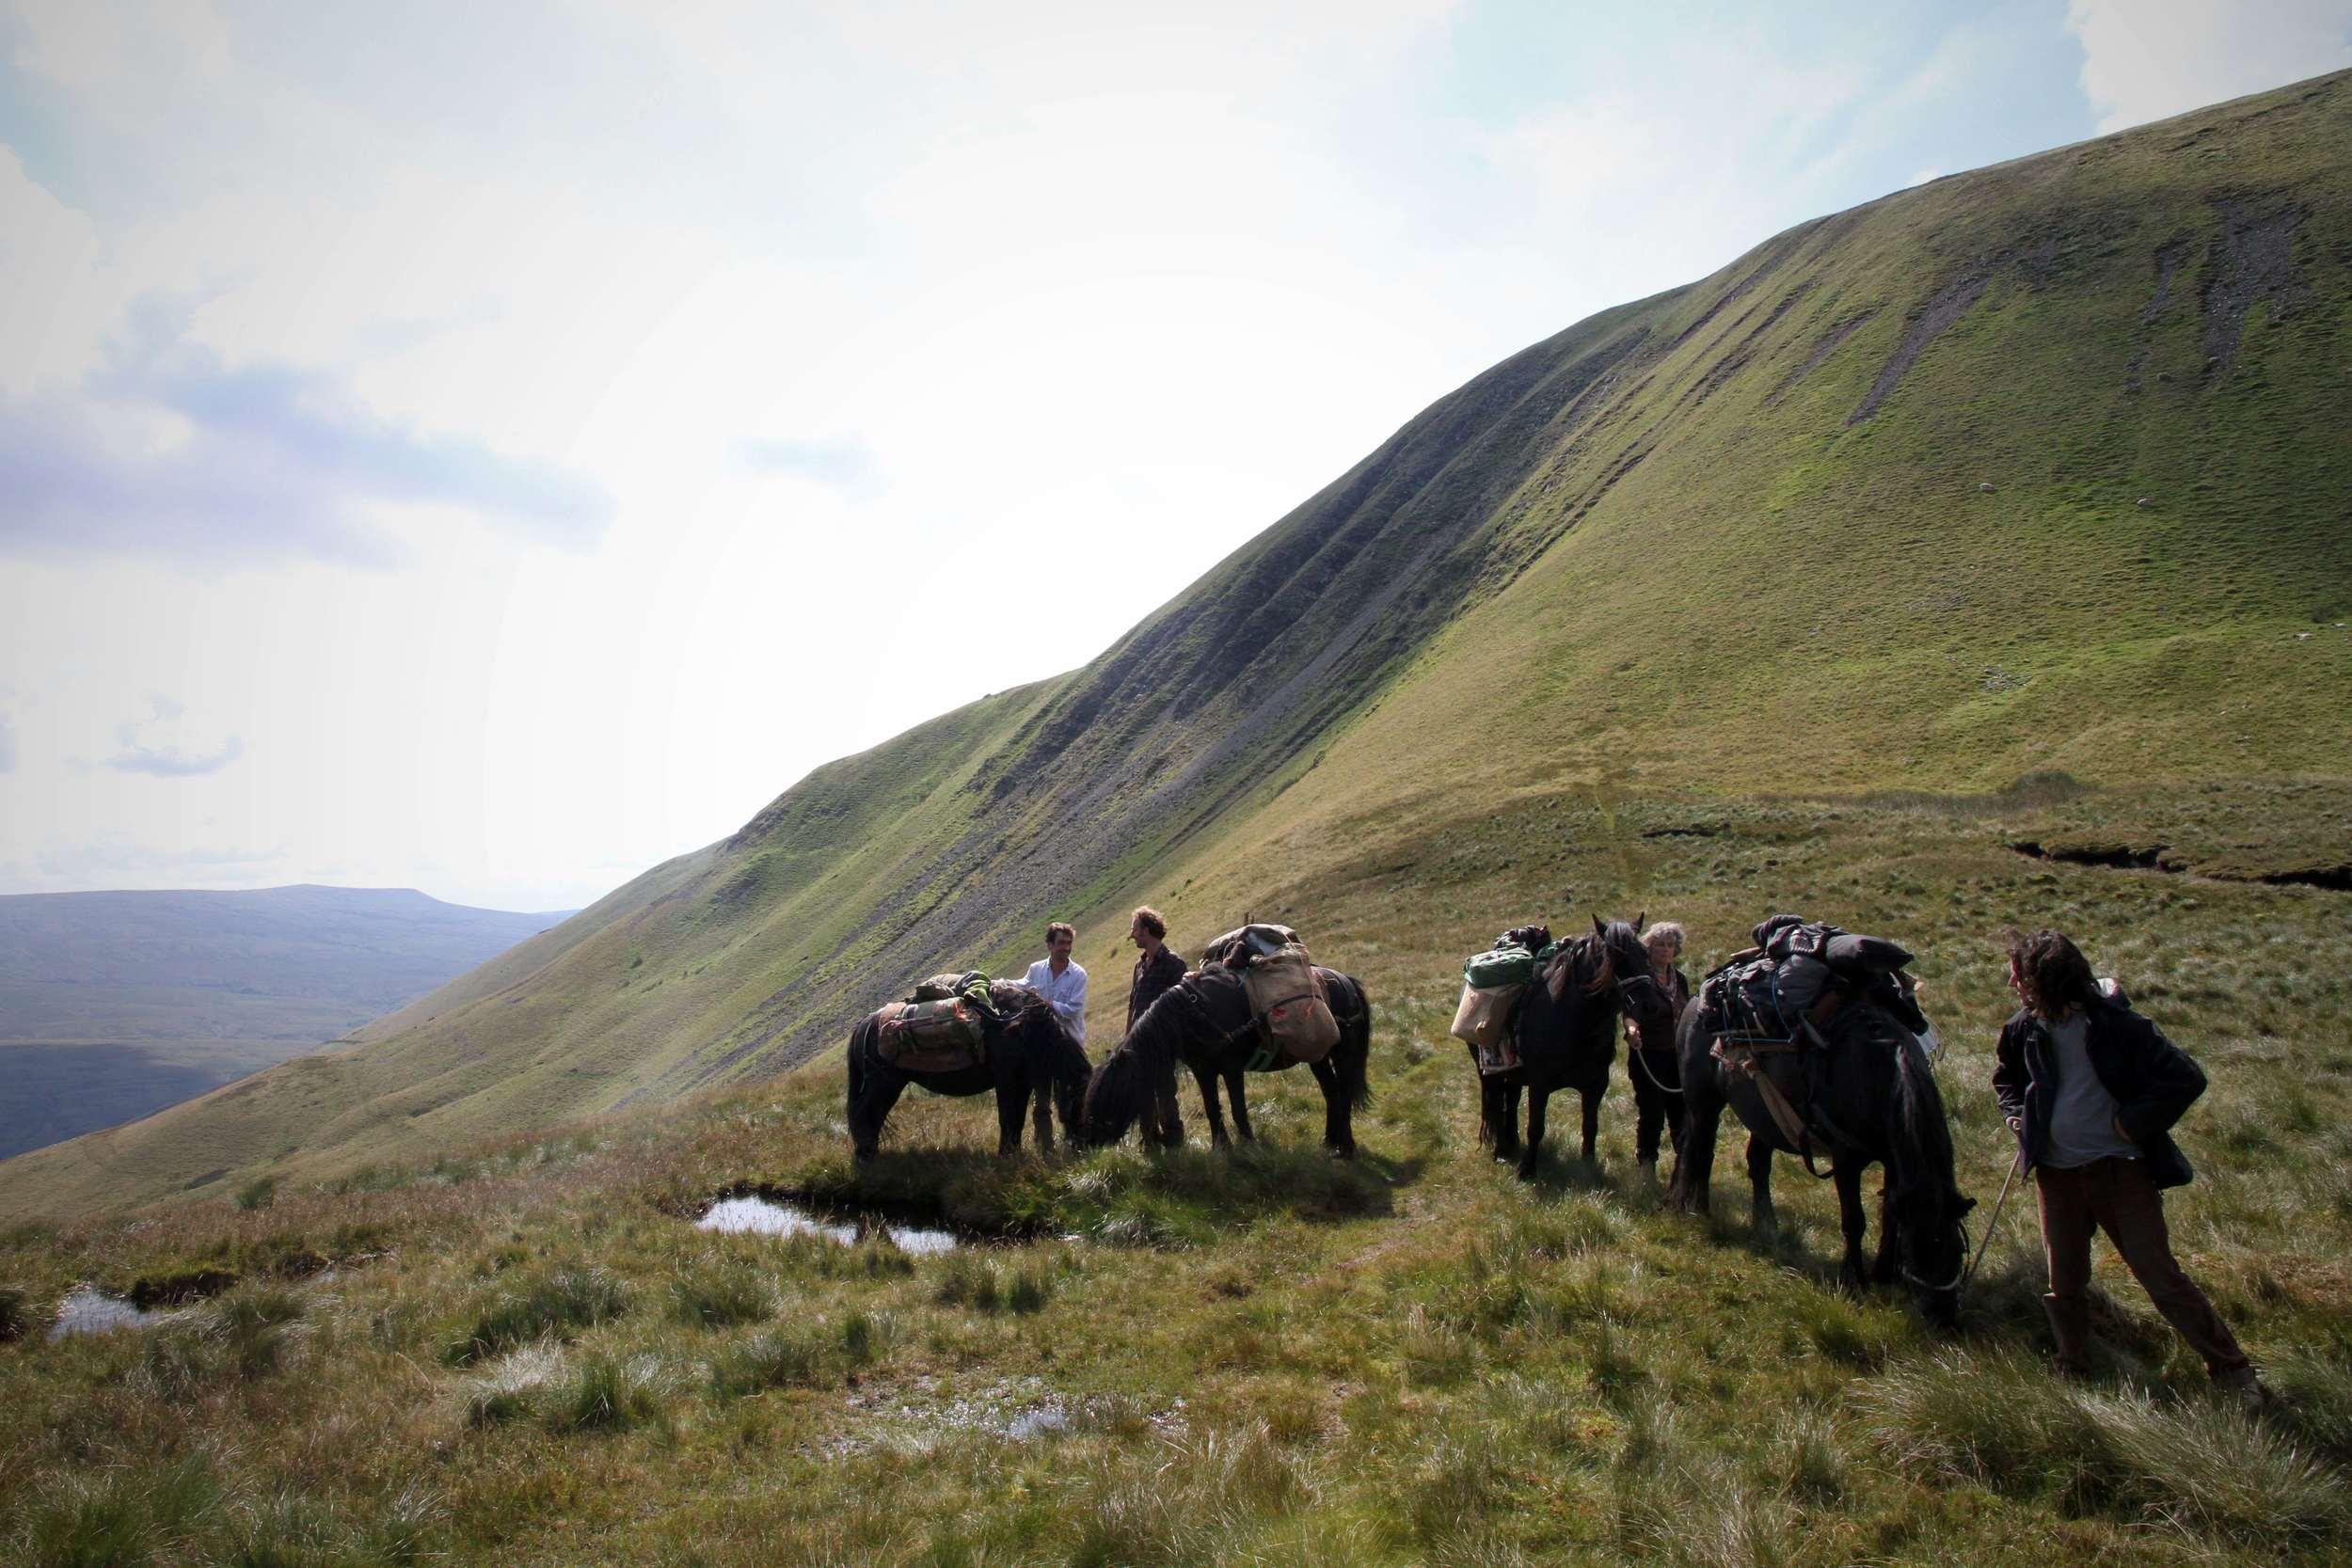 Hades Hill Ponies trecking over Yarleside, Ravenstonedale